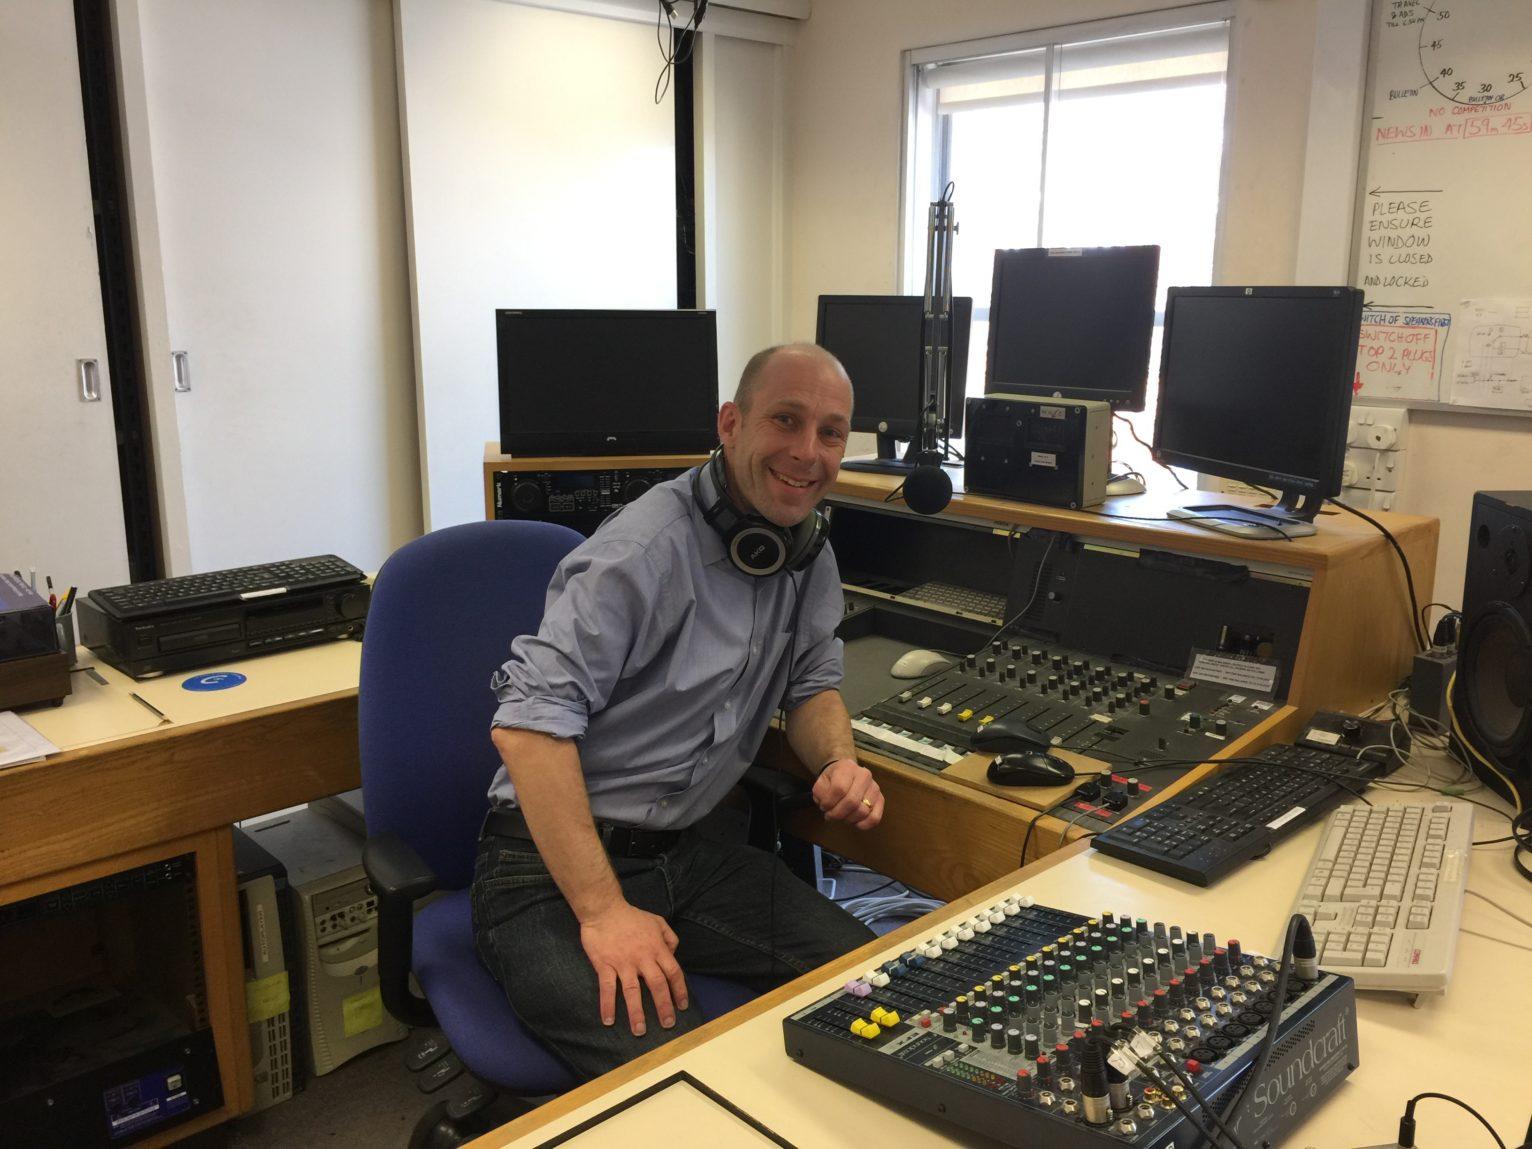 Surrey's Tim Mitchell talks about SEO copywriting/digital marketing